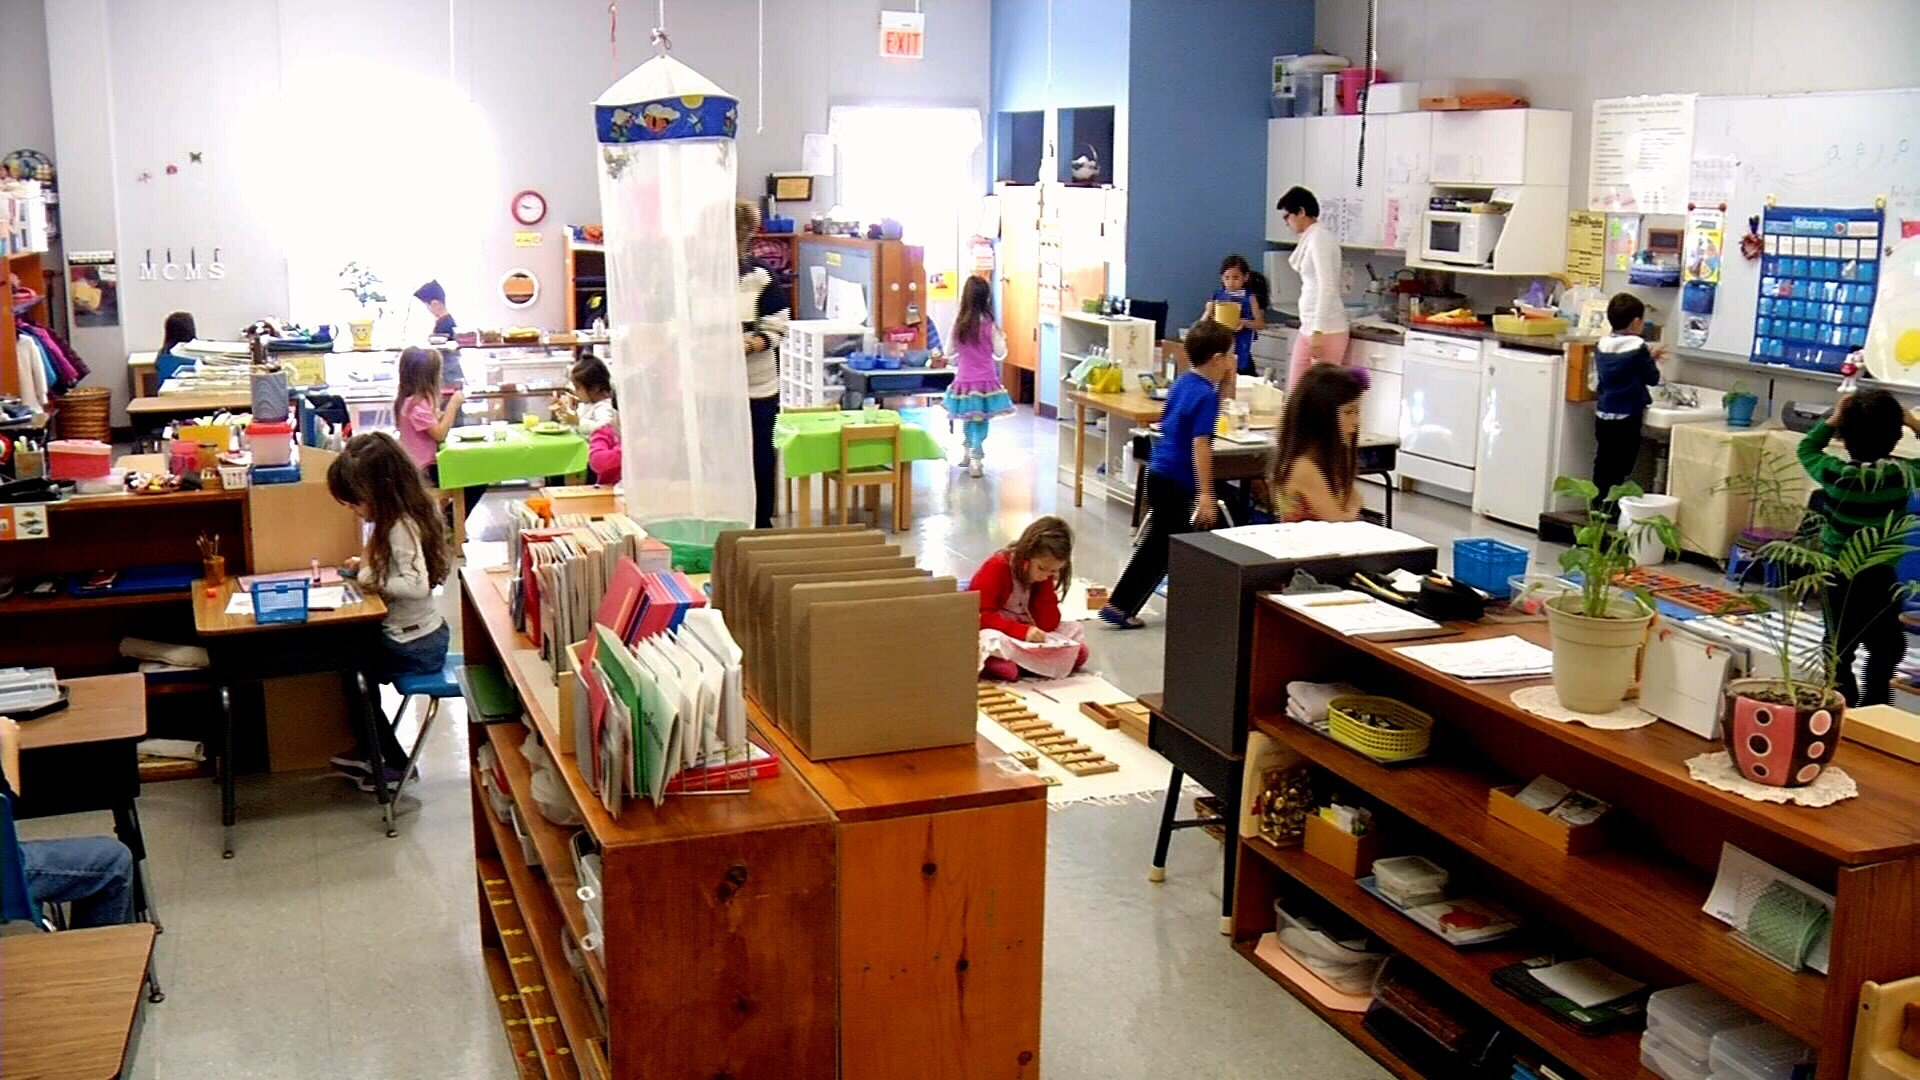 Mi Casita Montessori Spanish Immersion School   KRISTV.com | Continuous  News Coverage | Corpus Christi